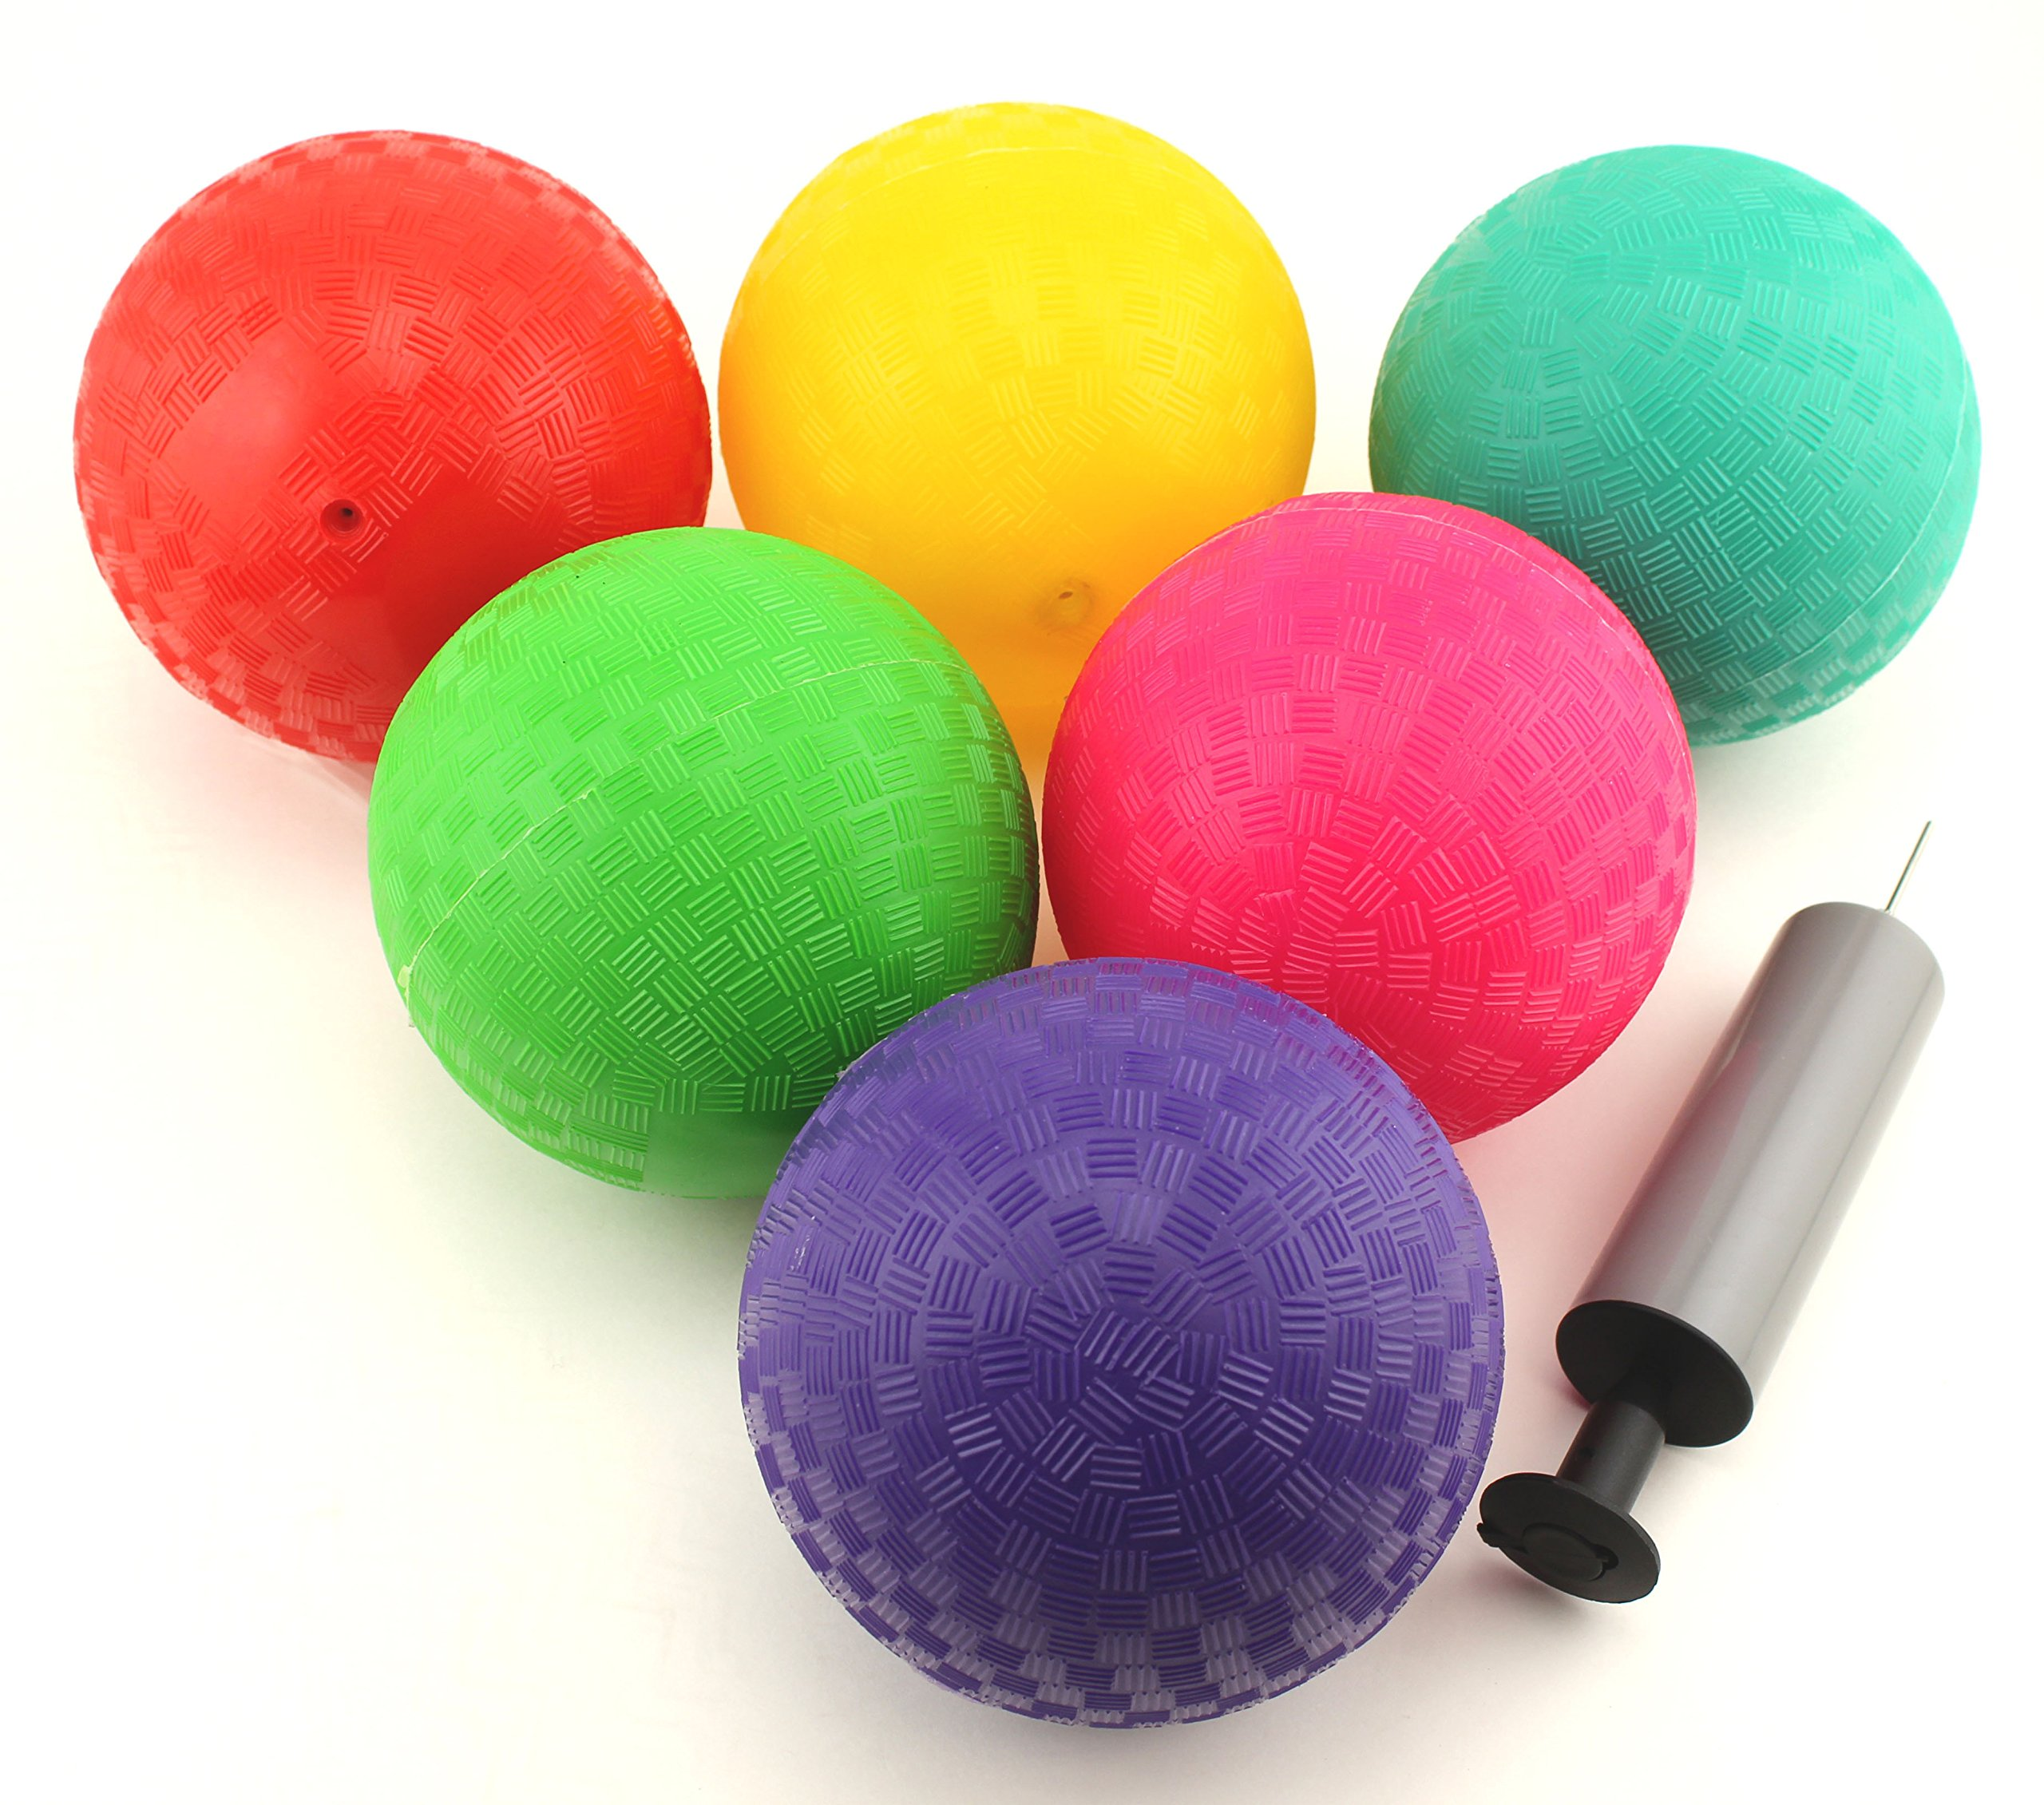 Ifavor123 Multi Color Mini Dodgeball Kickball Hand Pump Playballs - 6 Pack